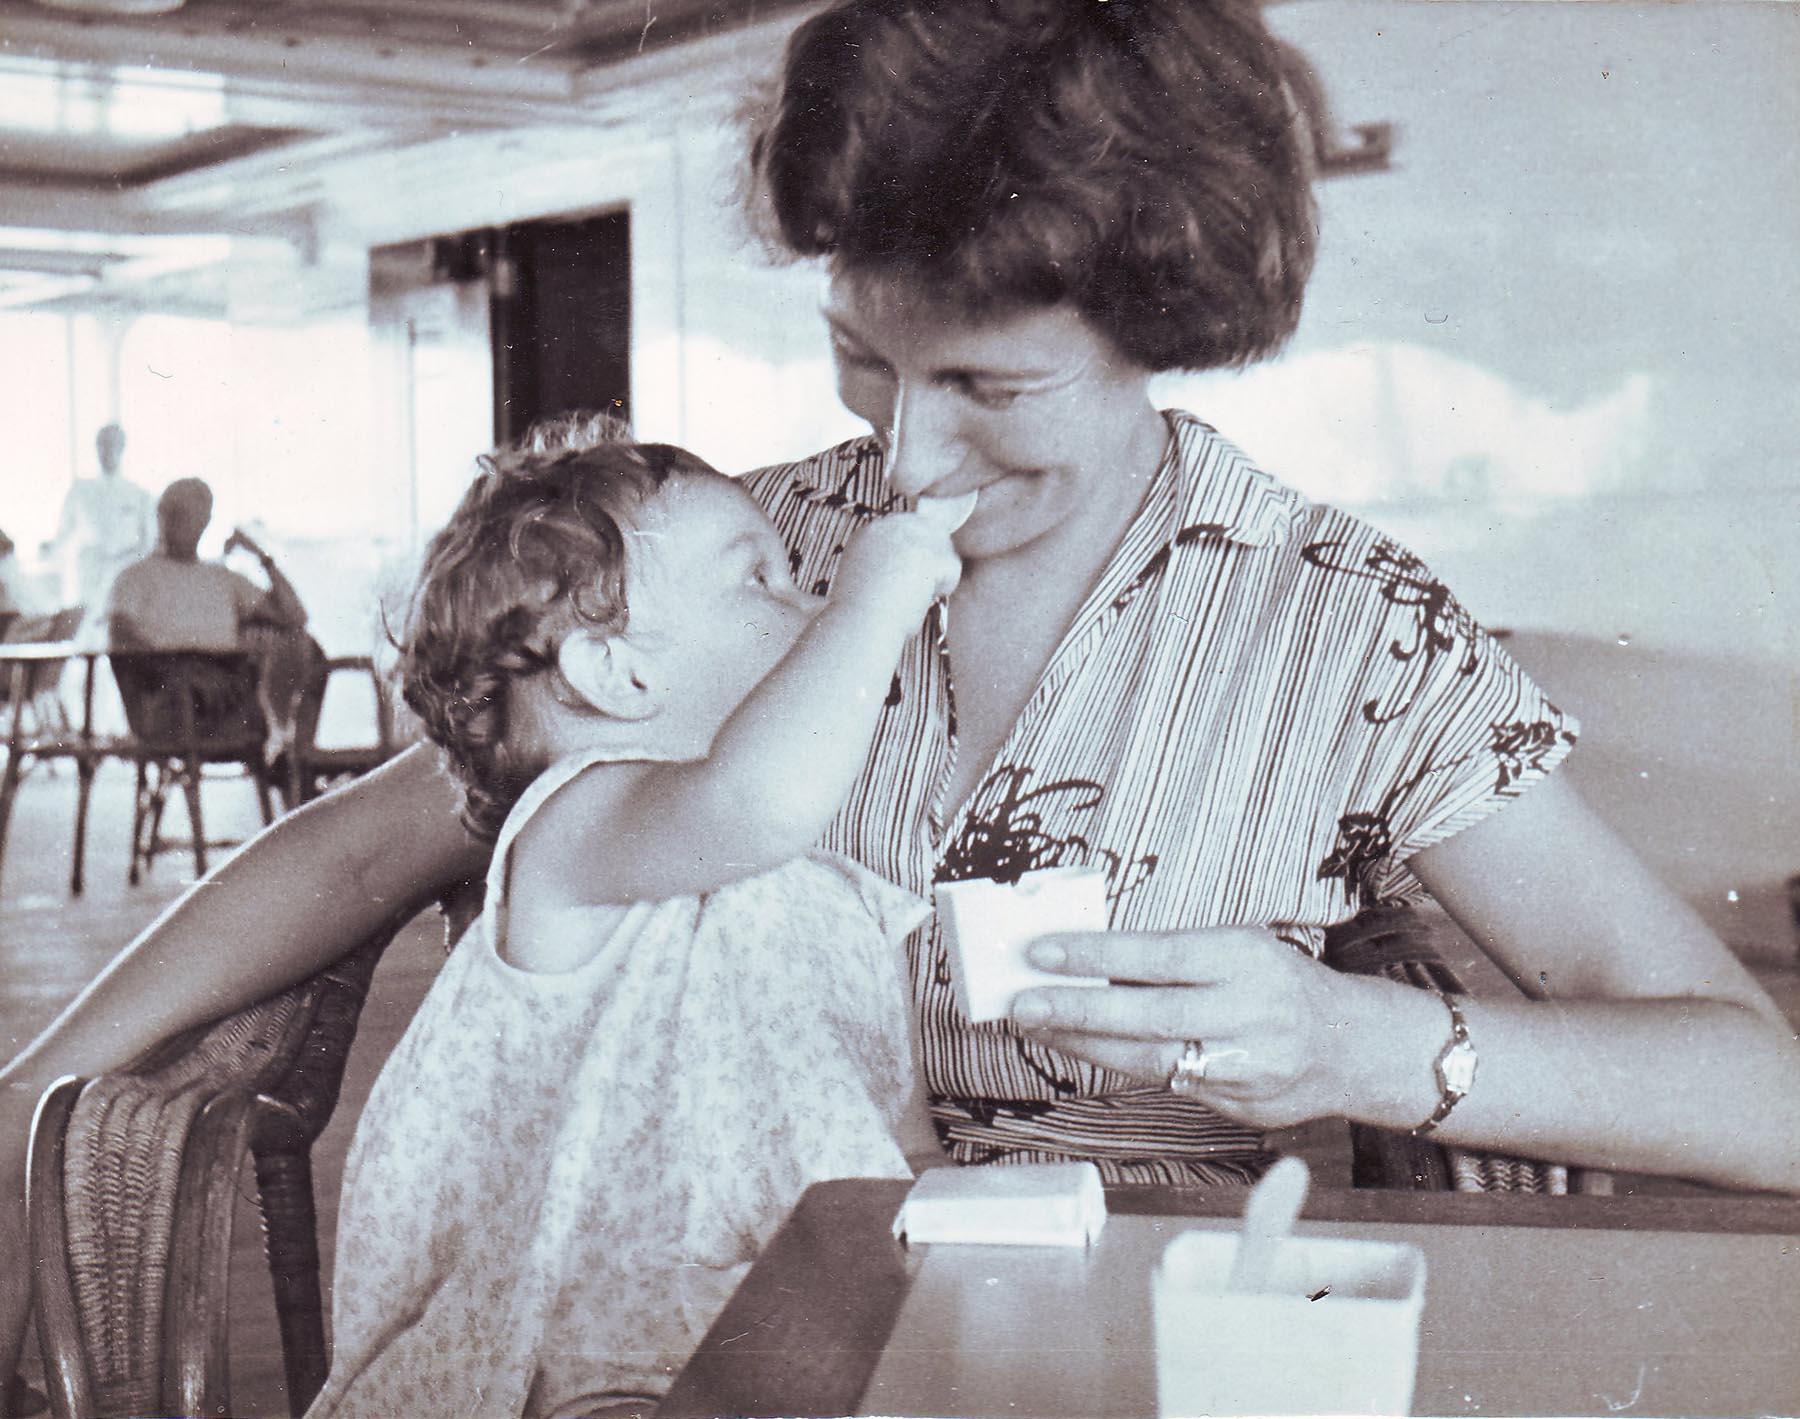 Katherine feeding Mary icecream 1955